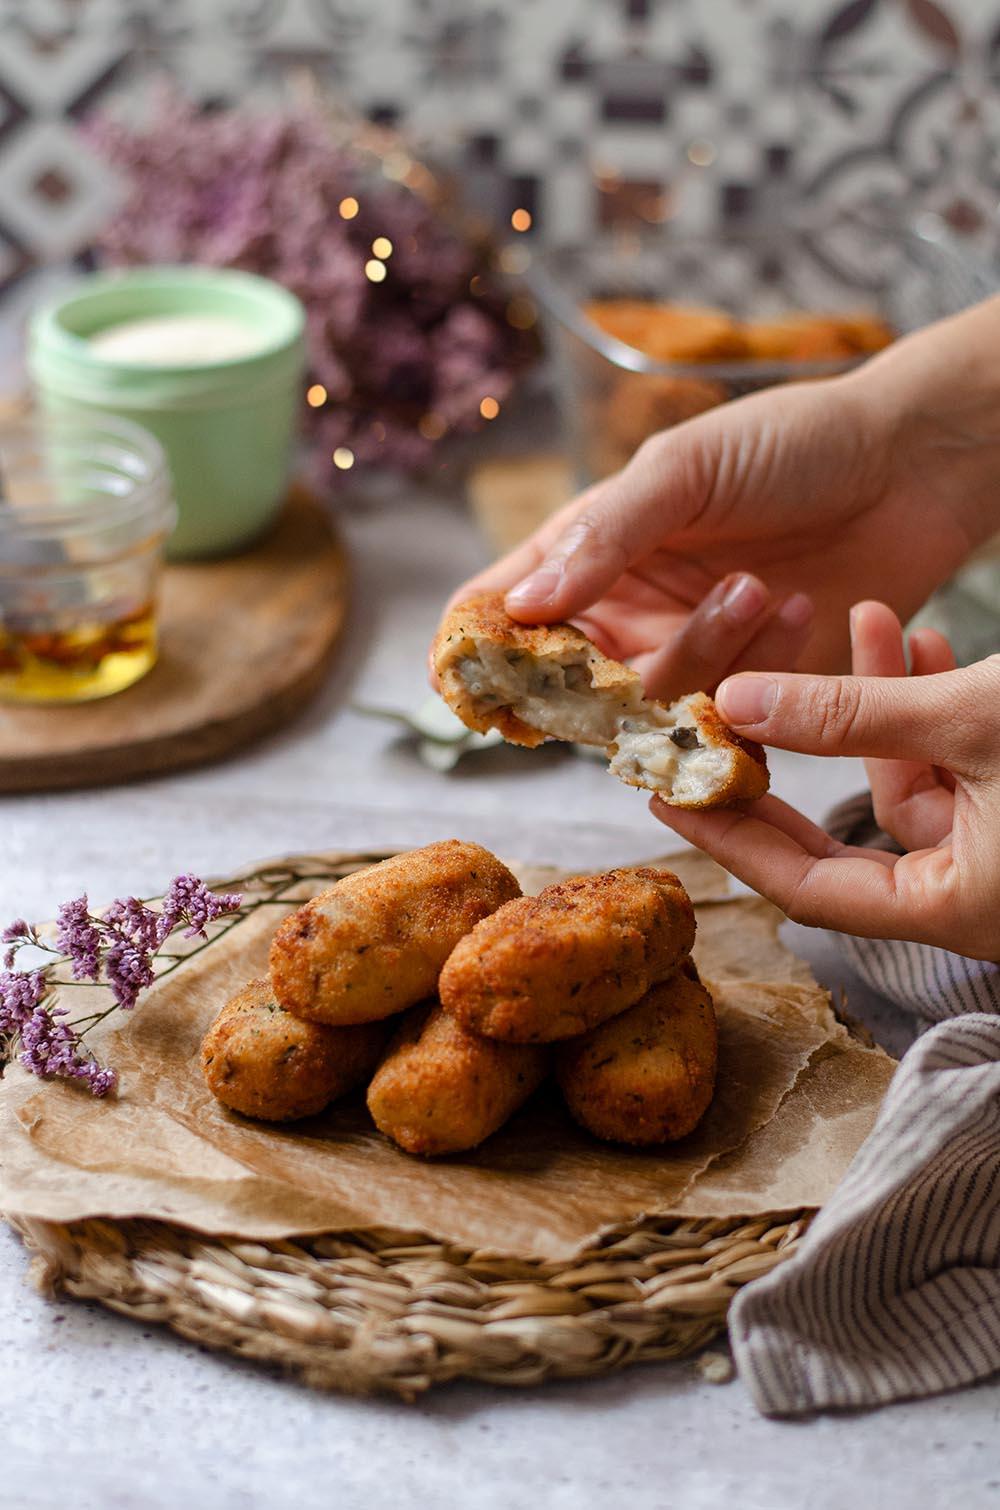 Menú vegano completo para Nochevieja gracias a ProVeg España